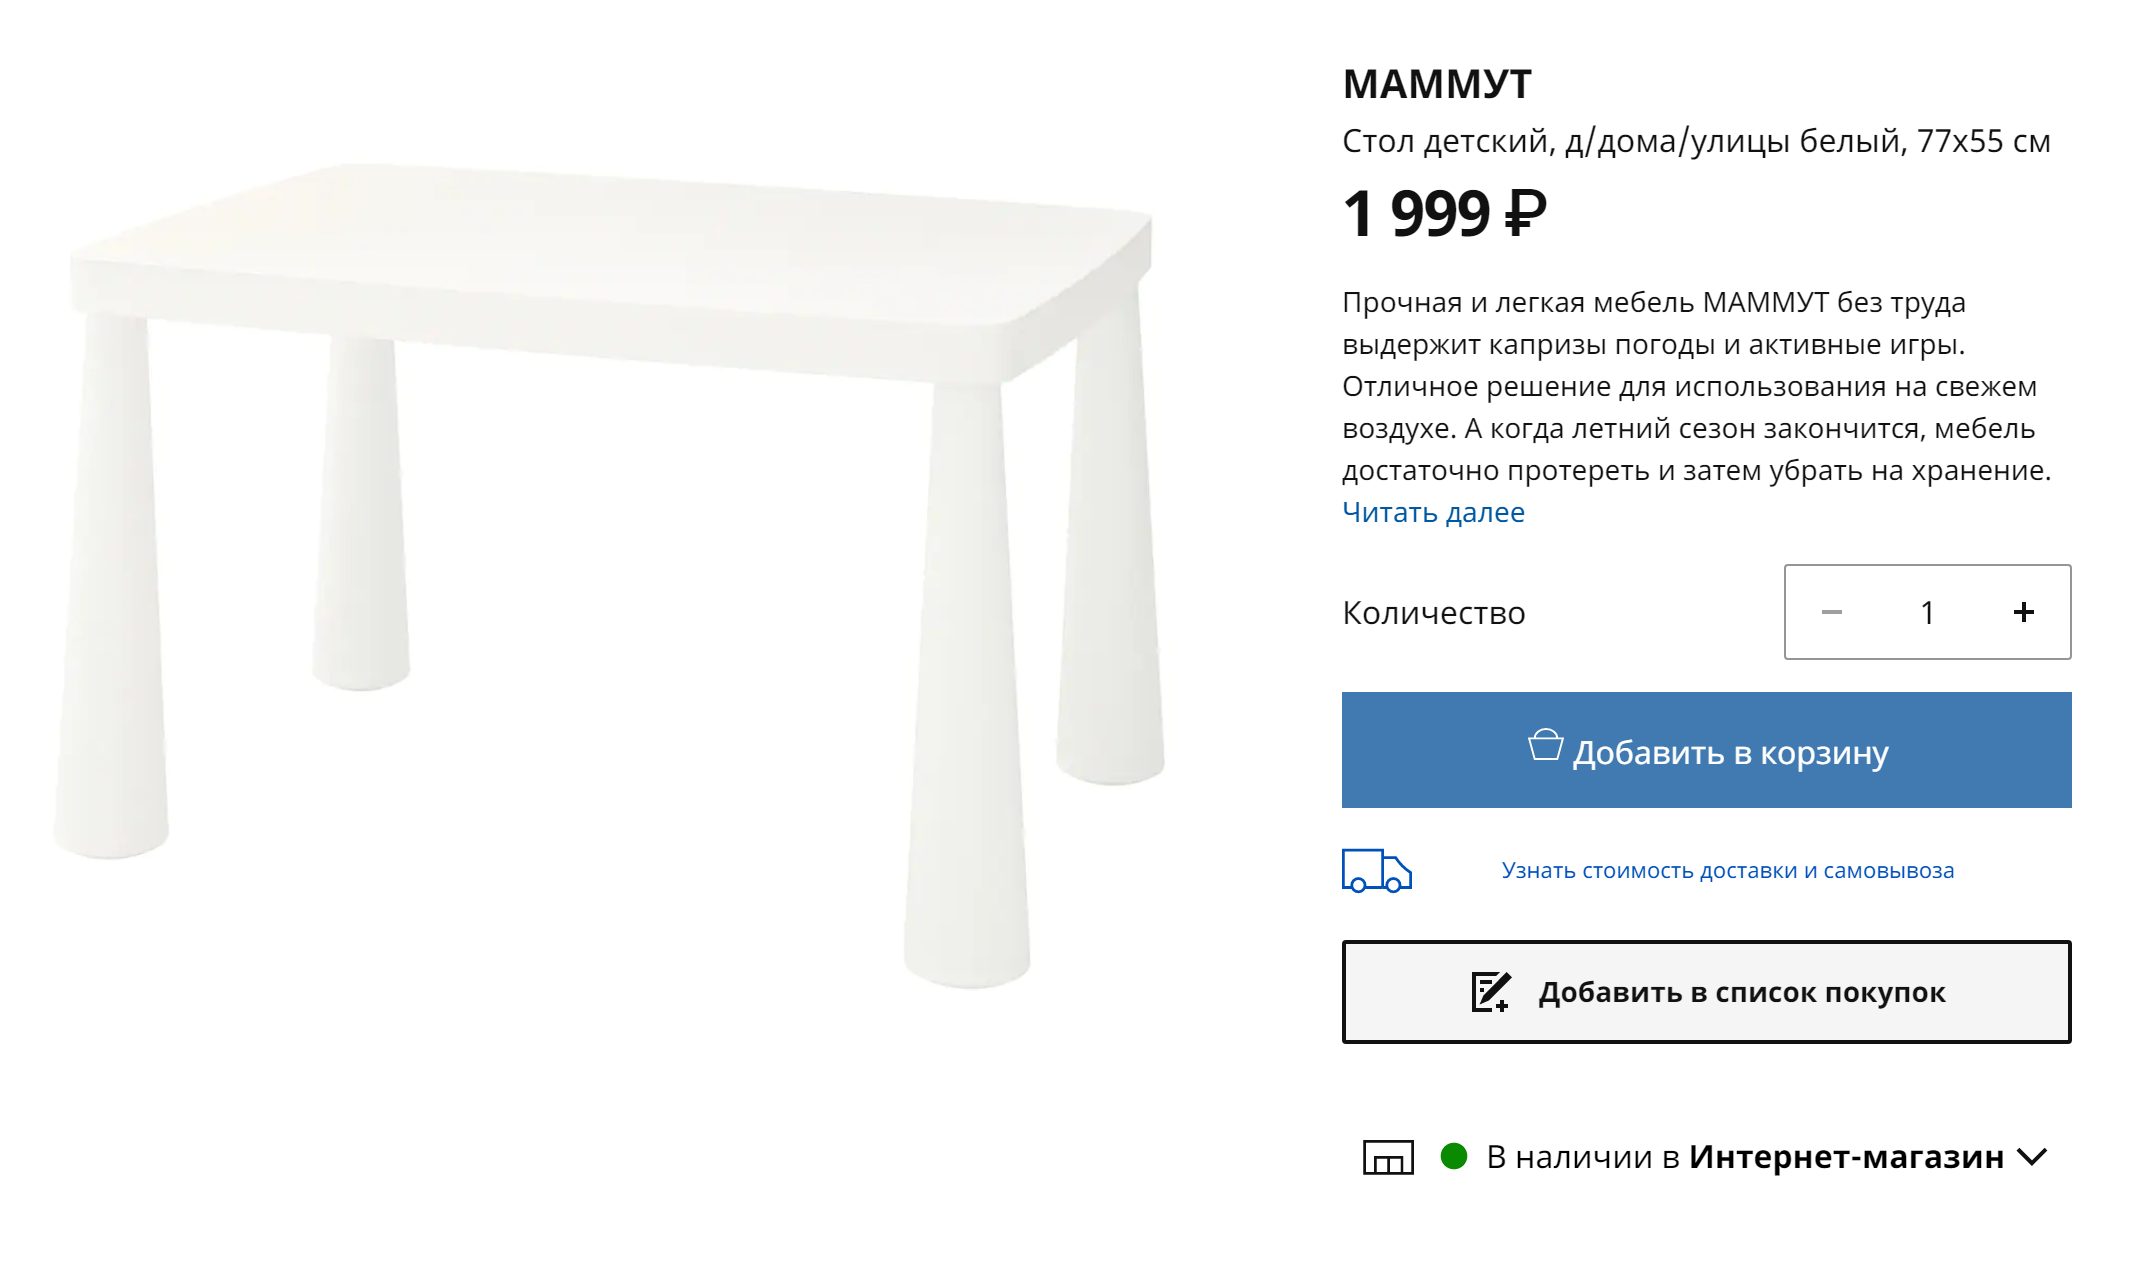 Детский стол обошелся всего в 2000<span class=ruble>Р</span>